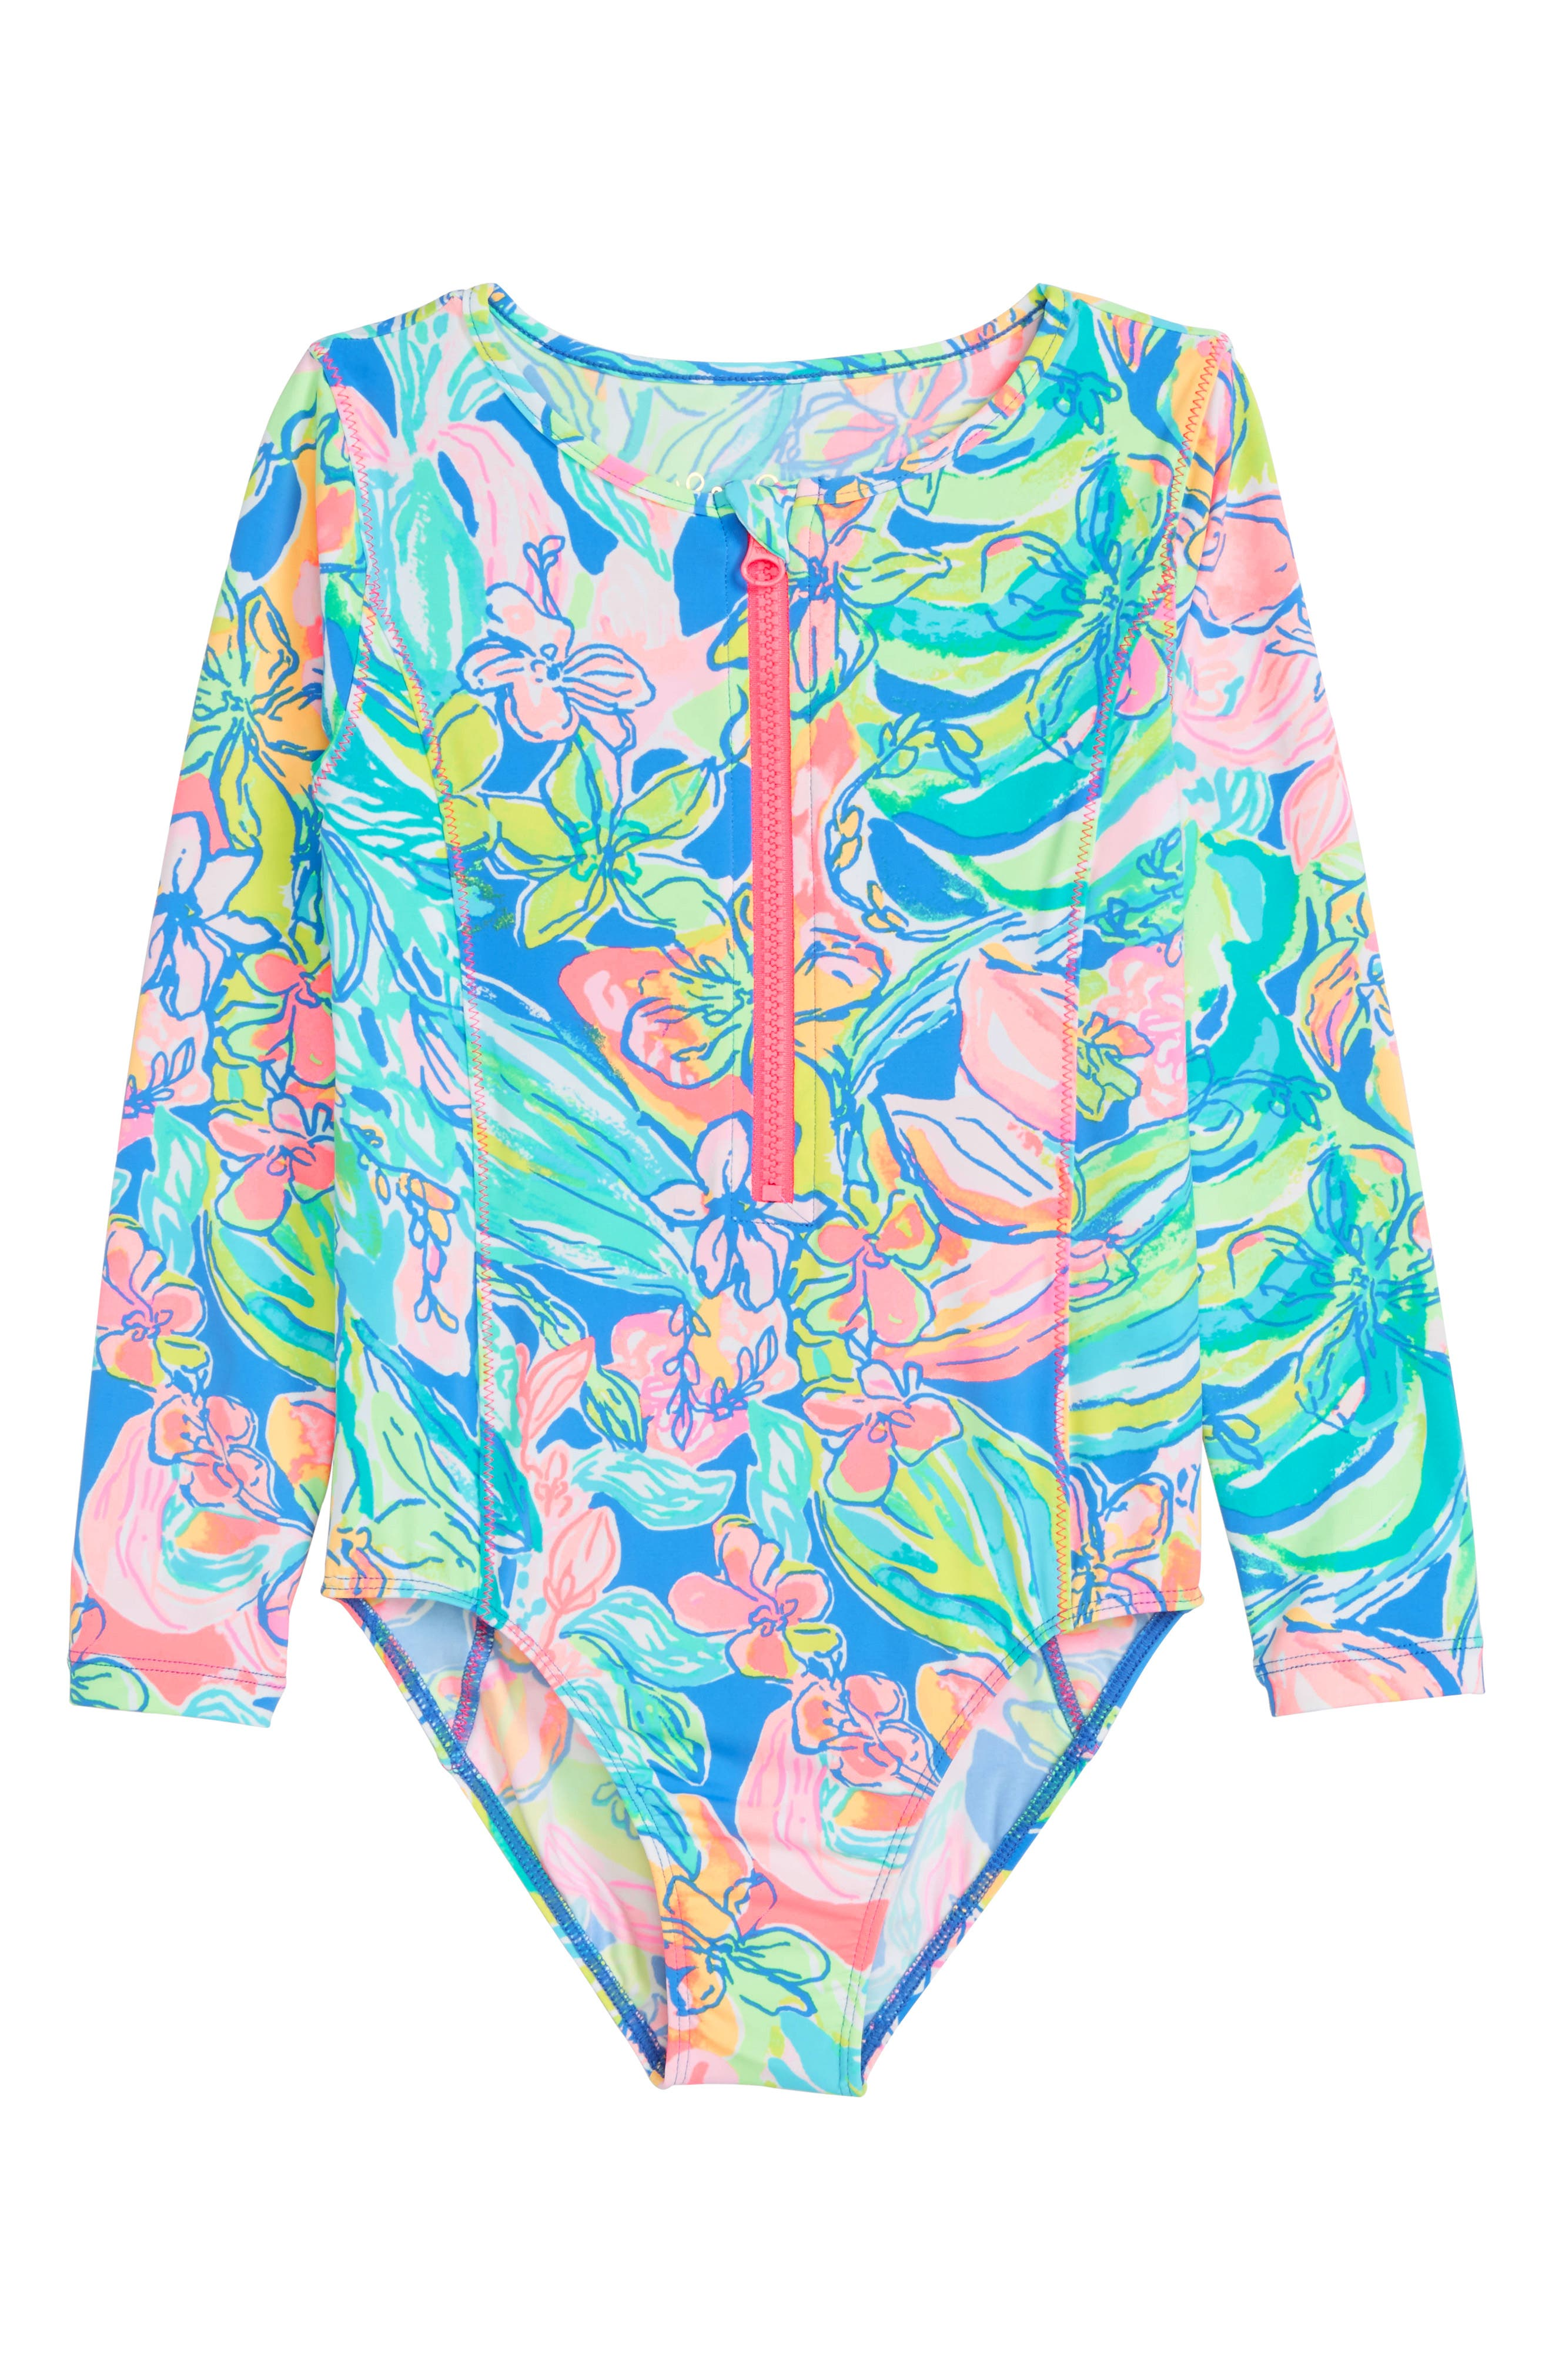 Aliana UPF 50+ One-Piece Rashguard Swimsuit,                             Main thumbnail 1, color,                             Bennet Blue Surf Gypsea